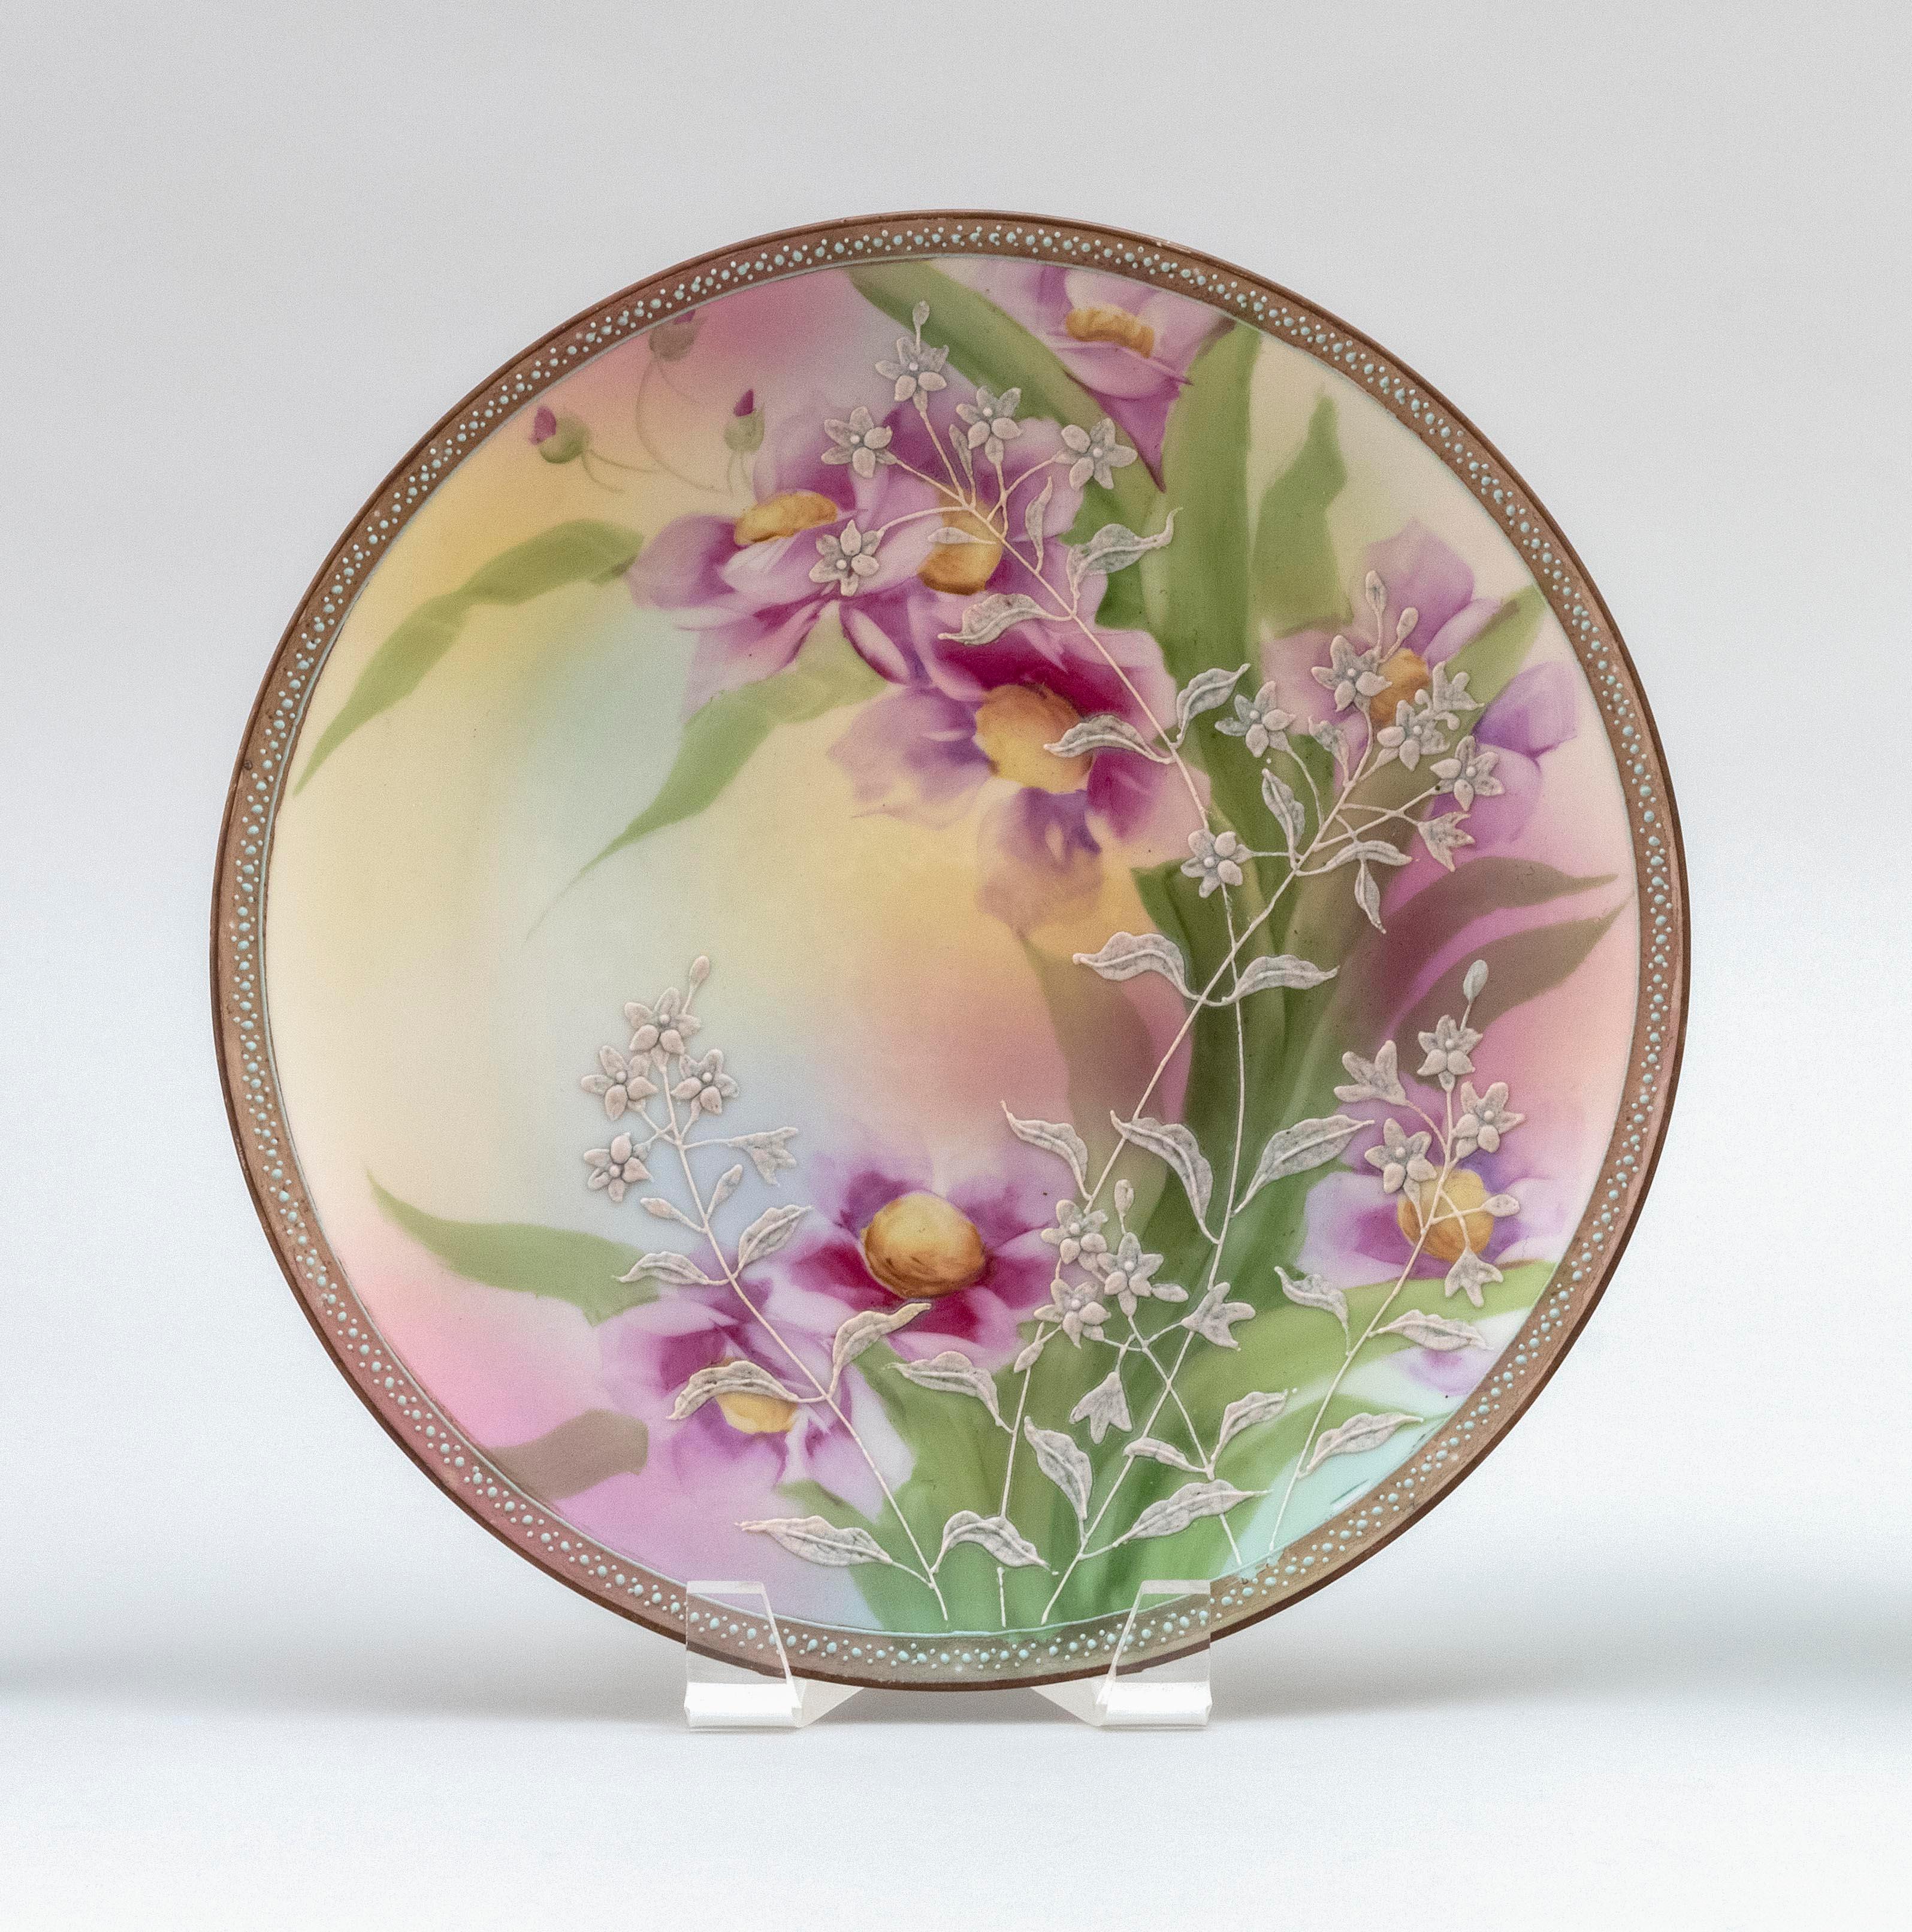 "MORIAGE NIPPON PORCELAIN PLAQUE With a floral design on a purple floral-patterned ground. Van Patten #52 mark on base. Diameter 10""."